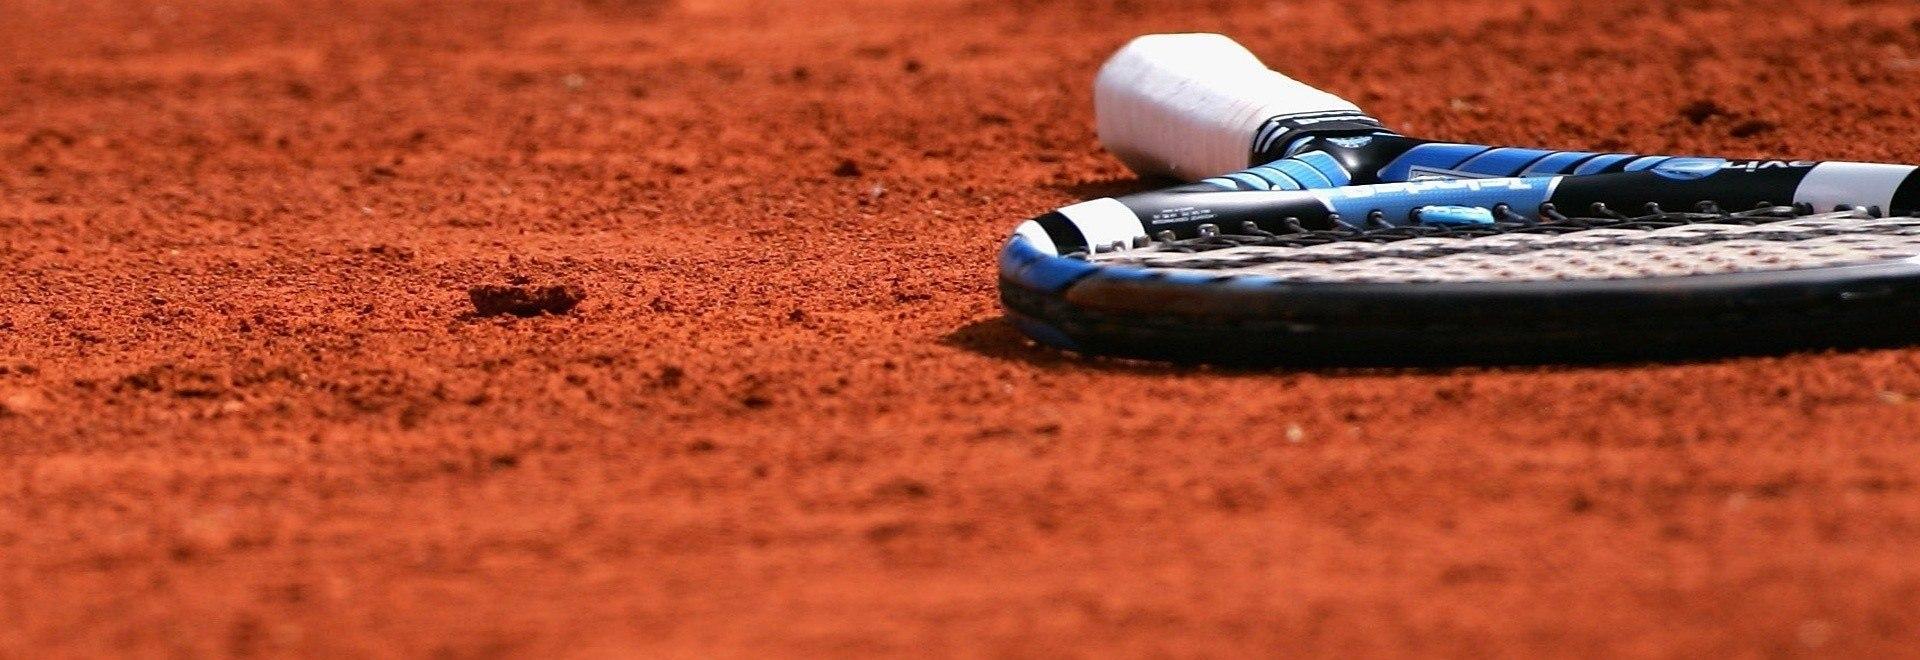 ATP World Tour Masters 1000 HL 2016 - Stag. 2016 - Londra